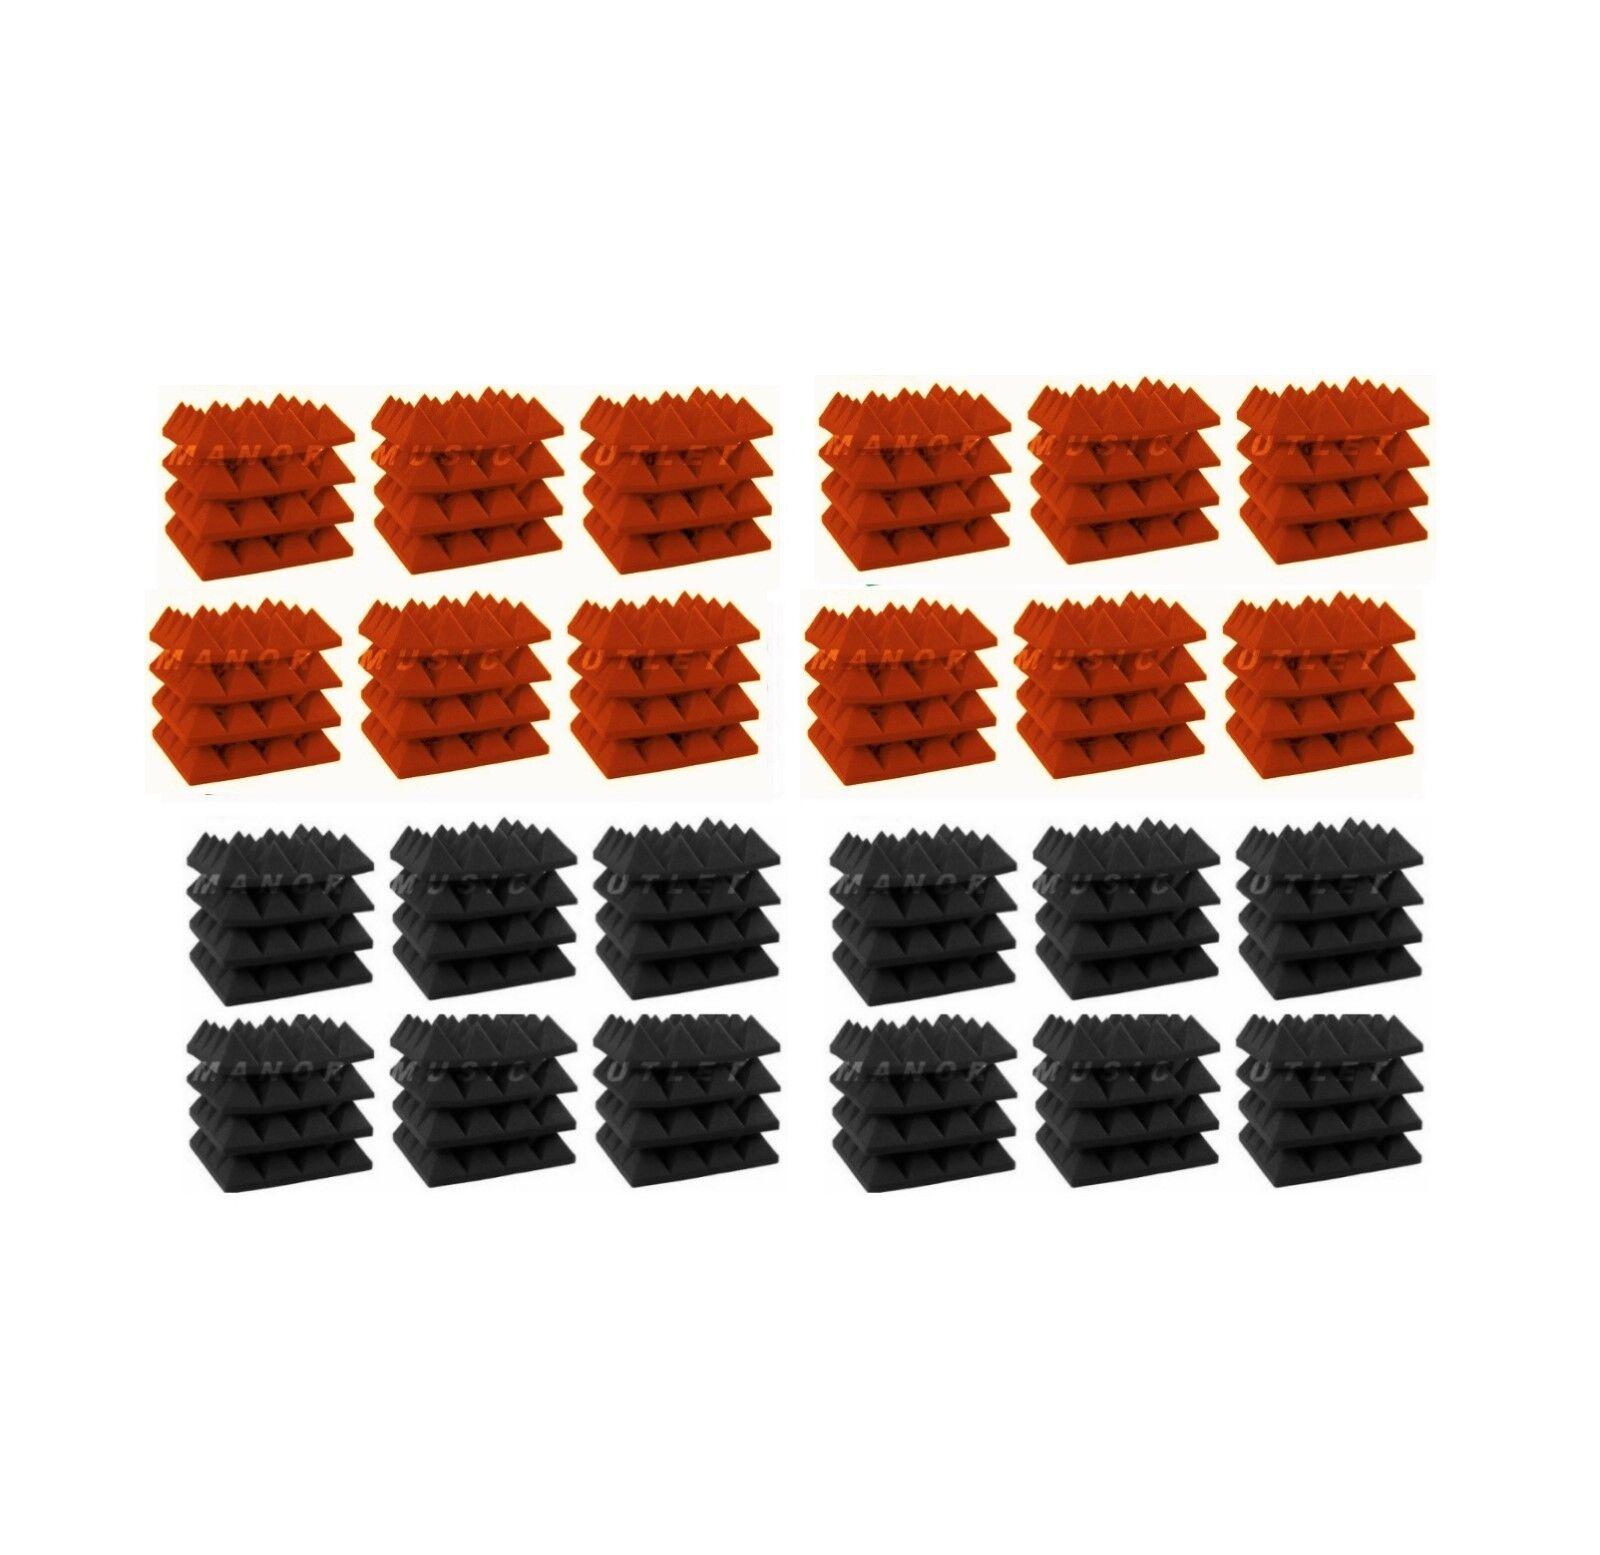 Acoustic Foam 96pcs Orange Charcoal grau Pyramide 12X12X3 Fliesen Pro-Pack Combo